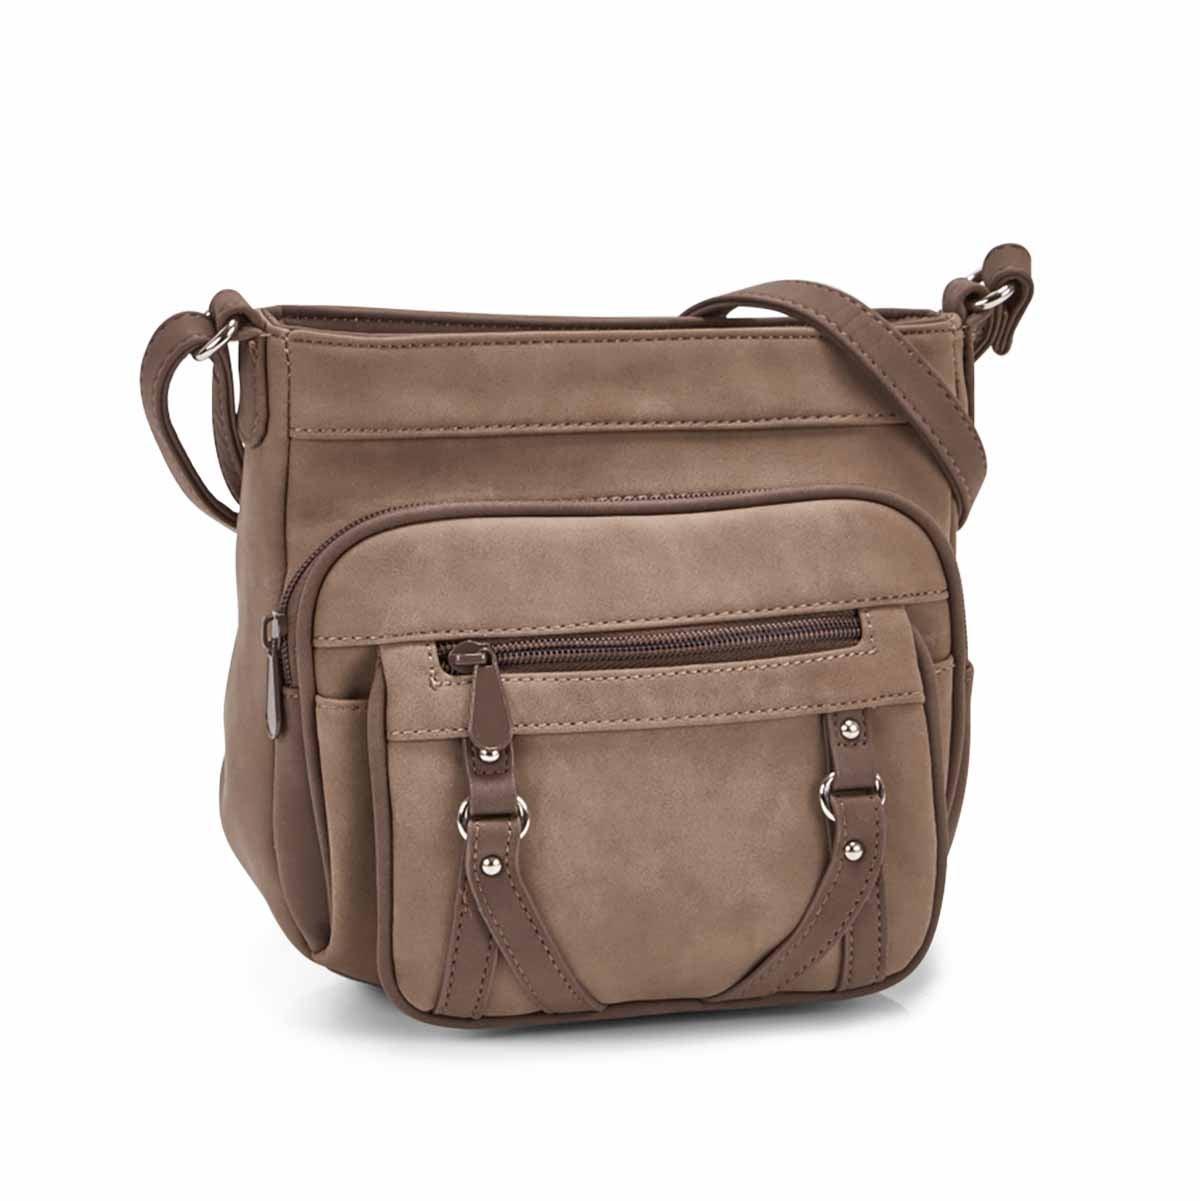 Women's PRIME MINI sand/coffee cross body bag